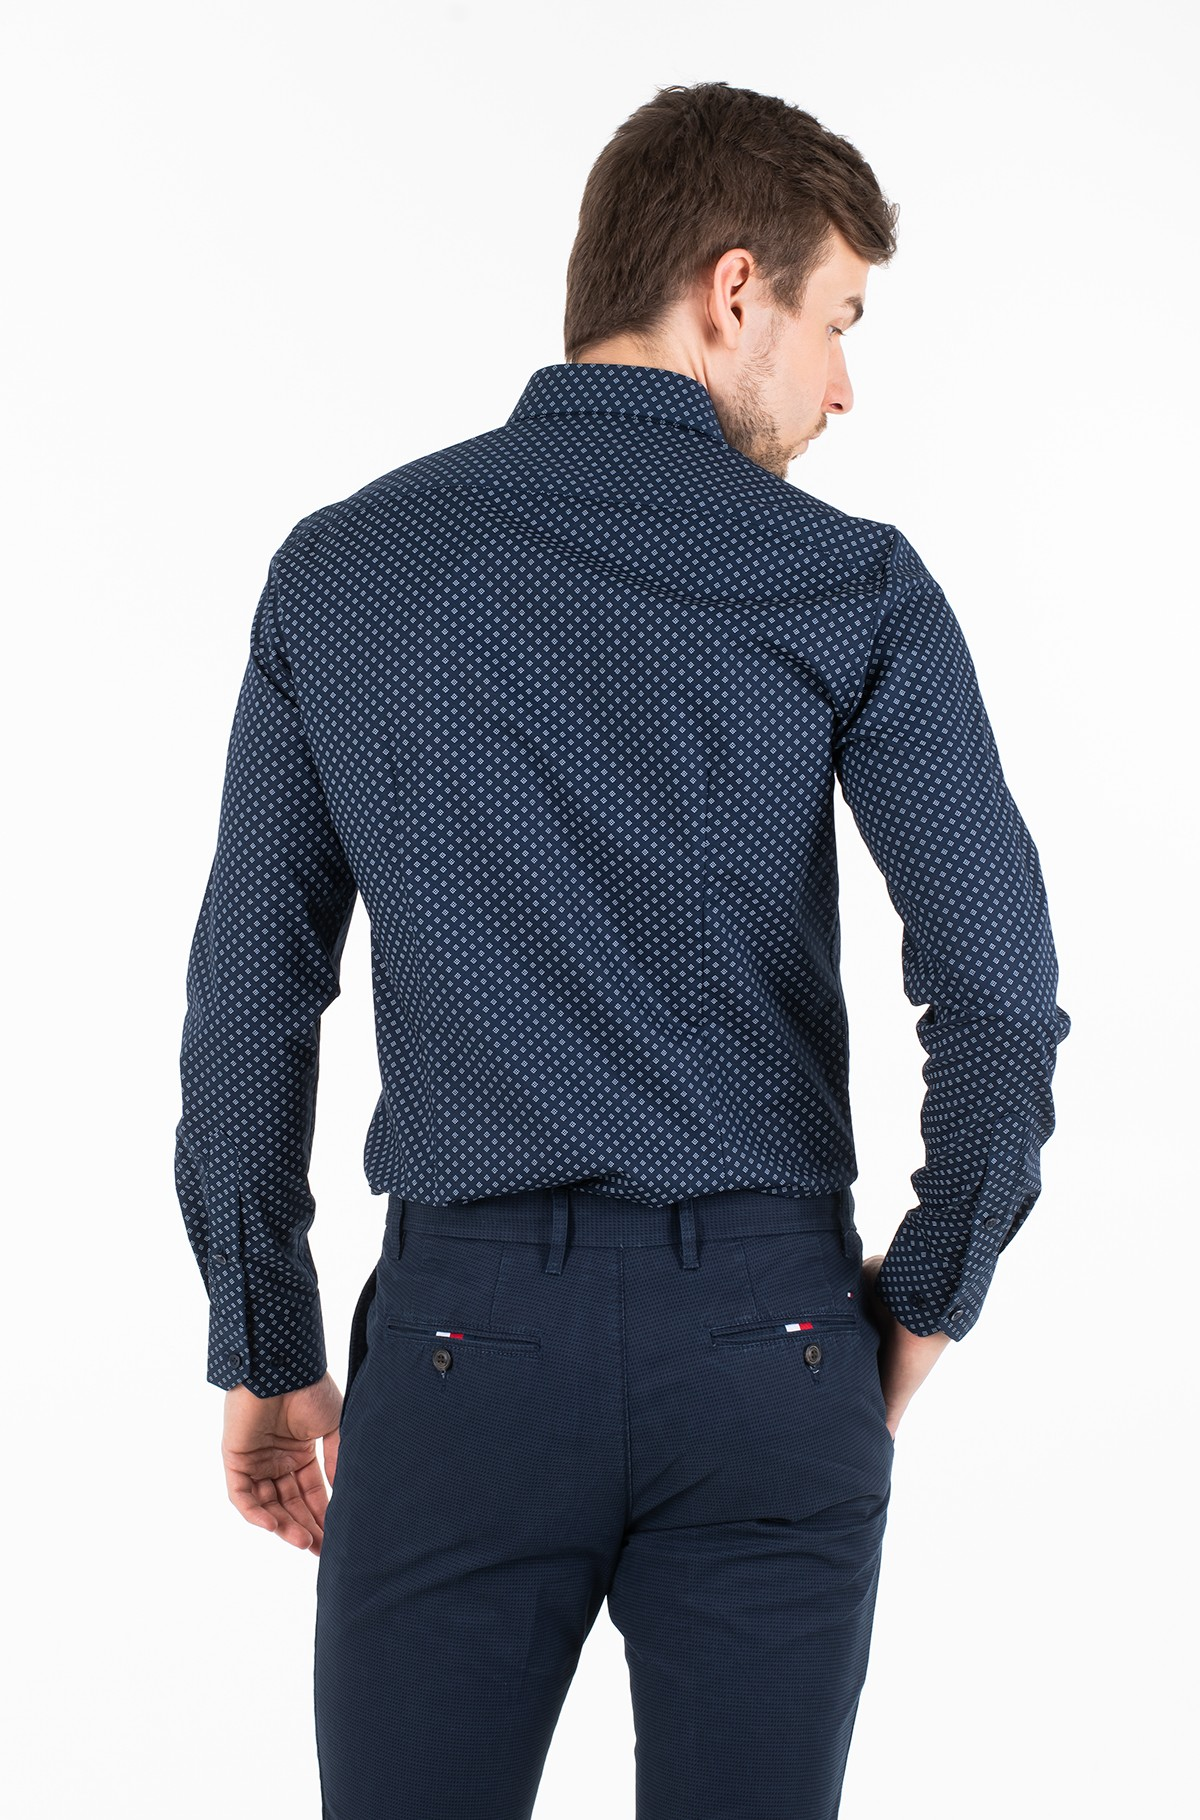 Marškiniai PRINT STRETCH CLASSIC SLIM SHIRT-full-2